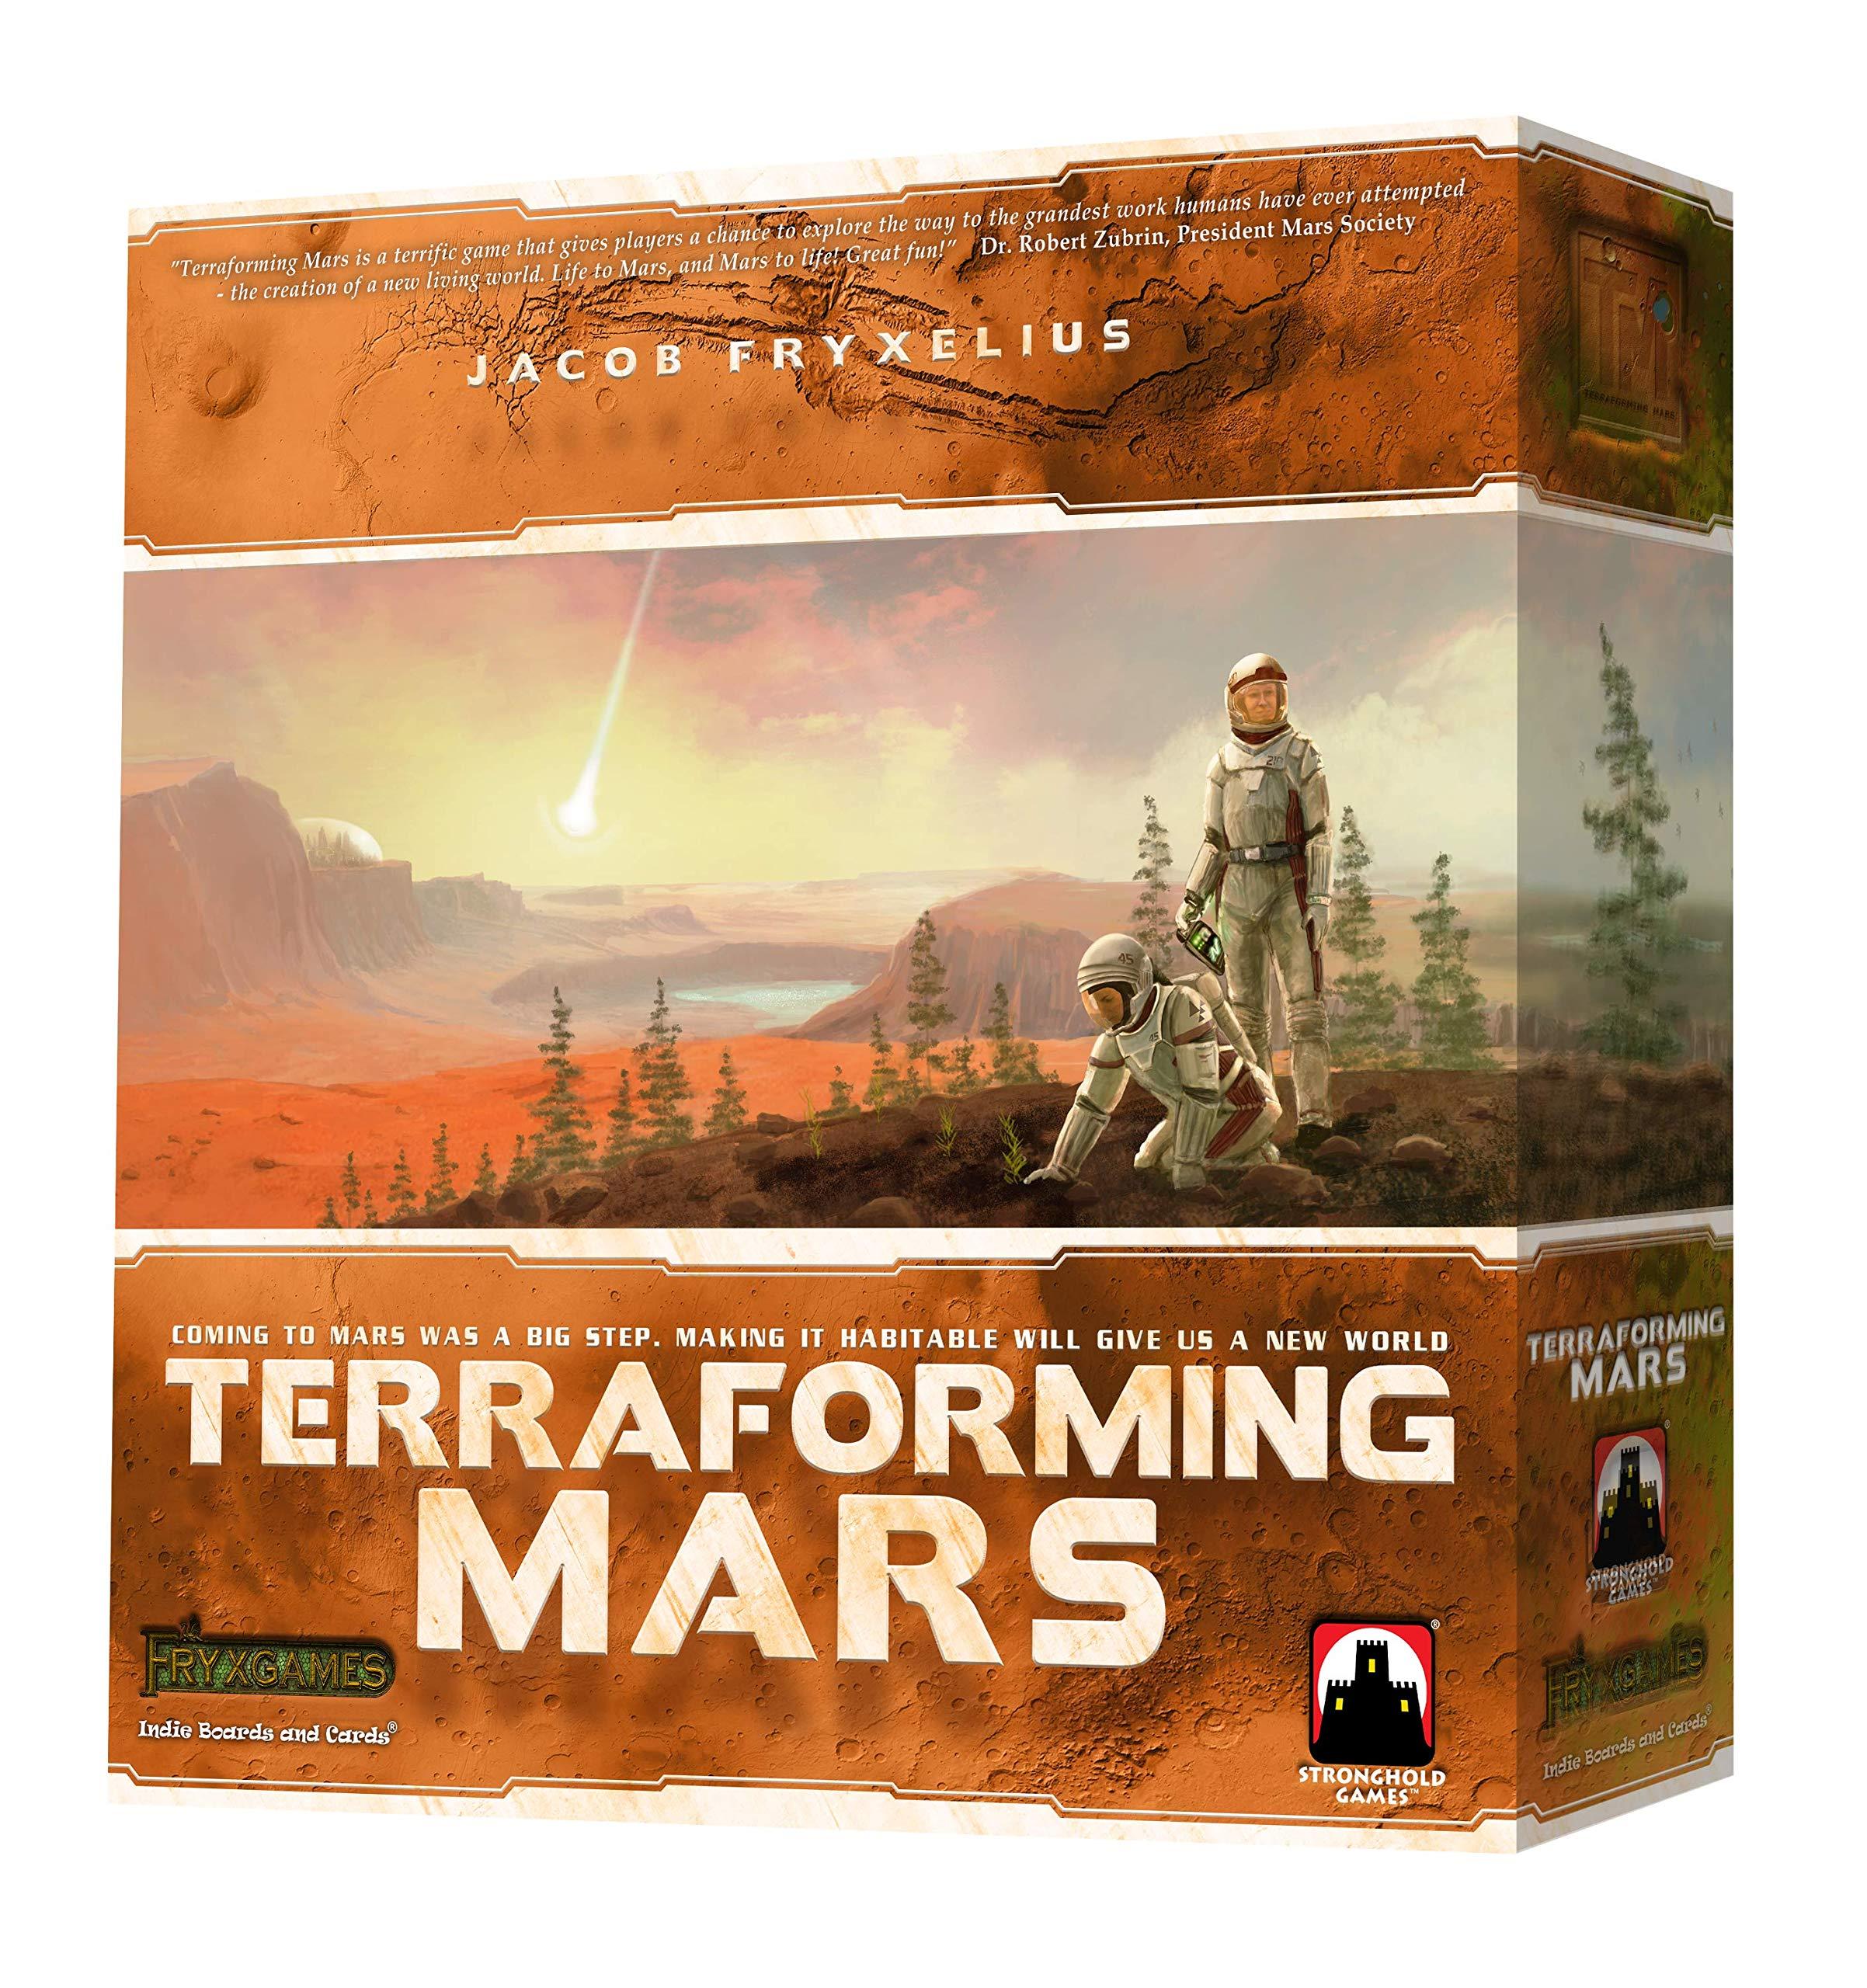 Terraforming Mars 棋盘游戏 144 months to 180 months Basic pack 多色